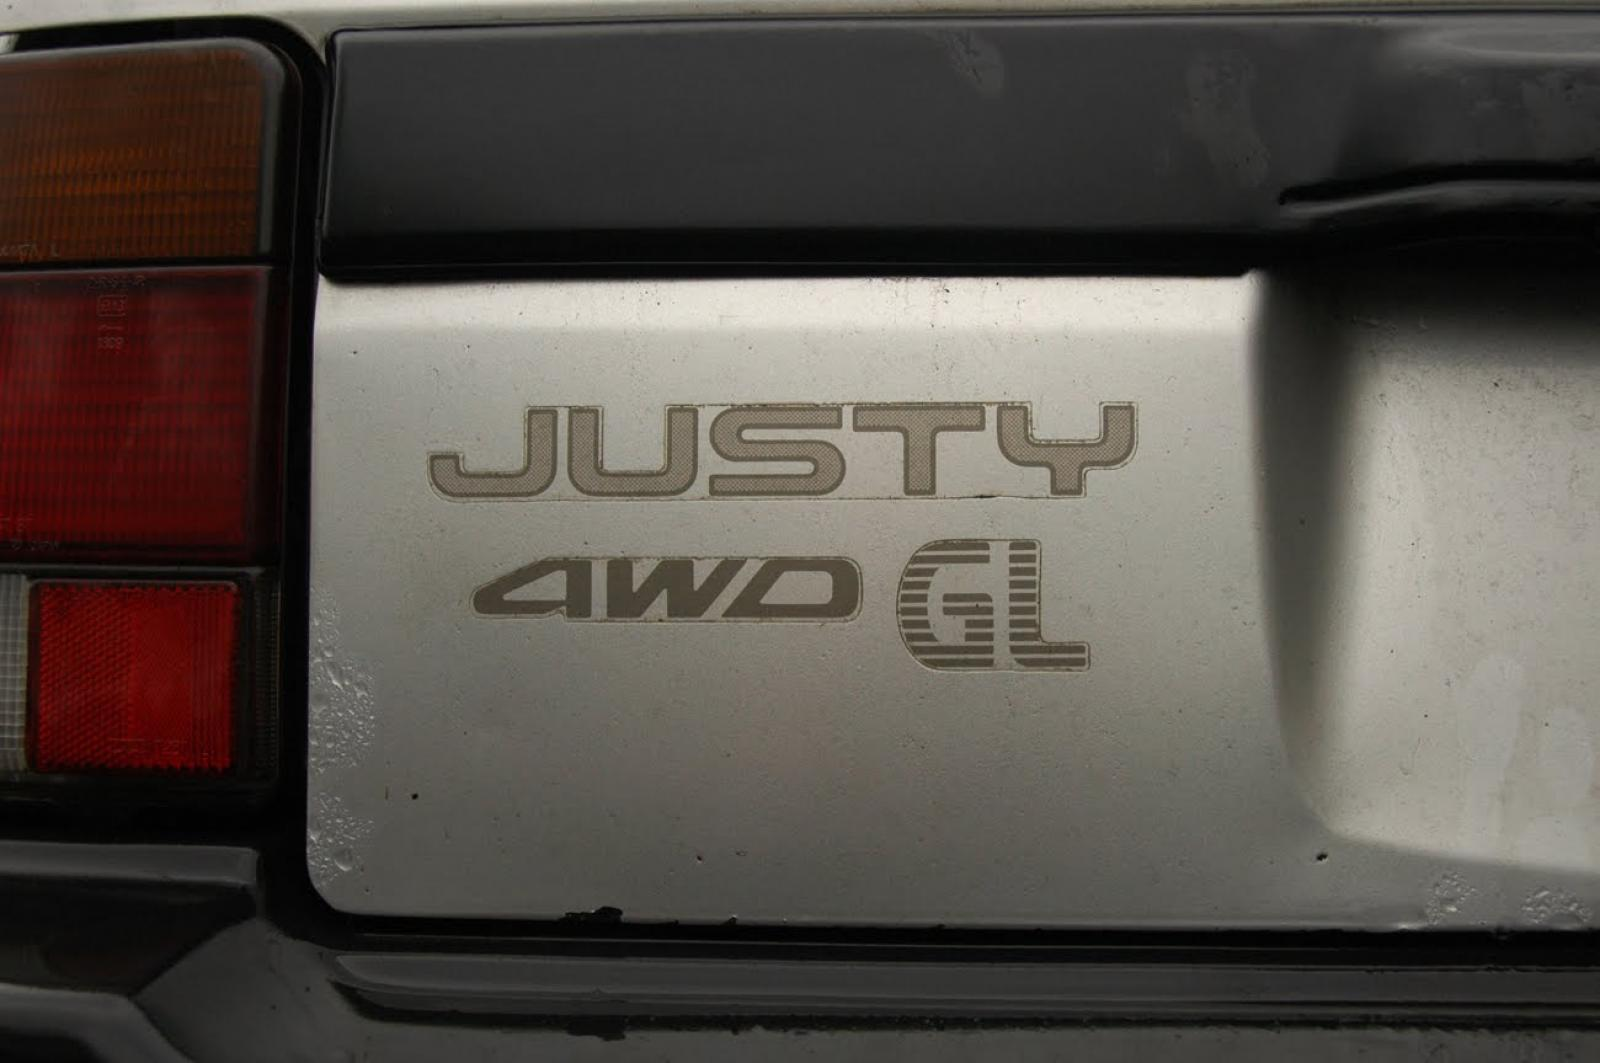 1990 Subaru Justy Information And Photos Zombiedrive 1992 Engine 800 1024 1280 1600 Origin